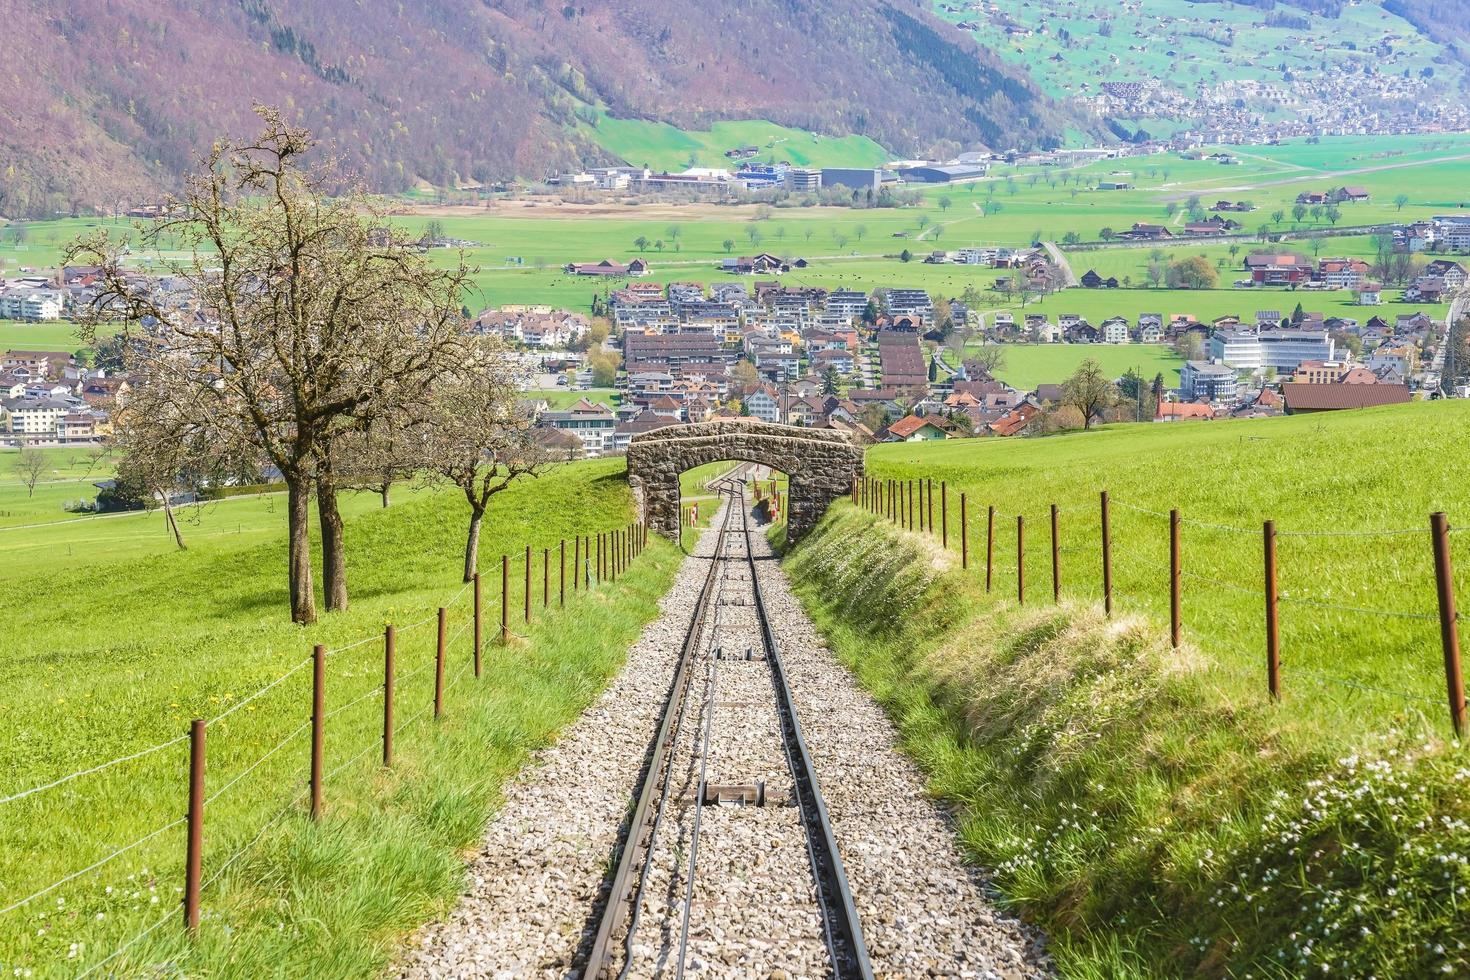 ferrovia a mt. stanserhorn, svizzera foto